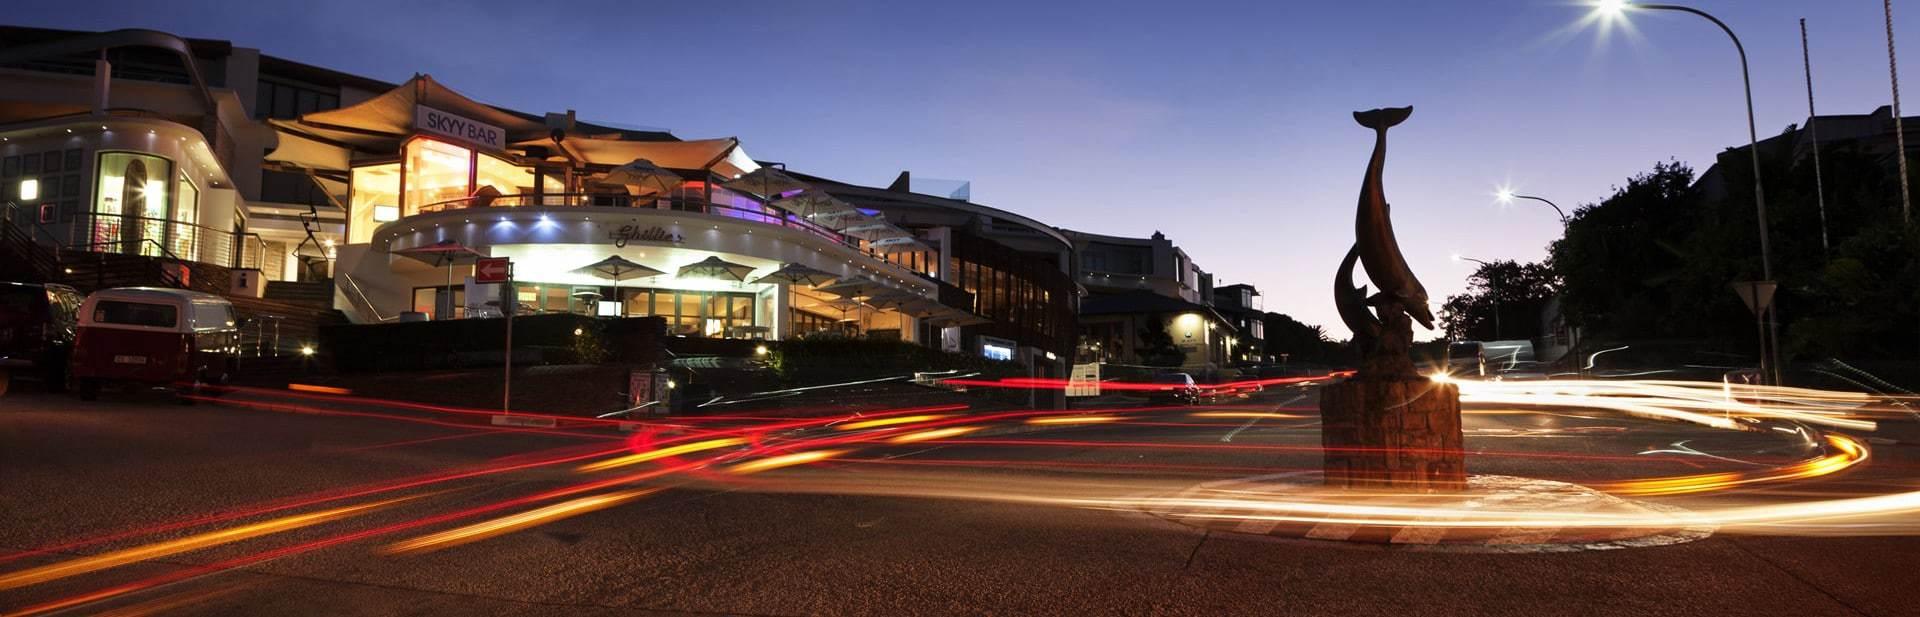 Plettenberg Bay Main Street